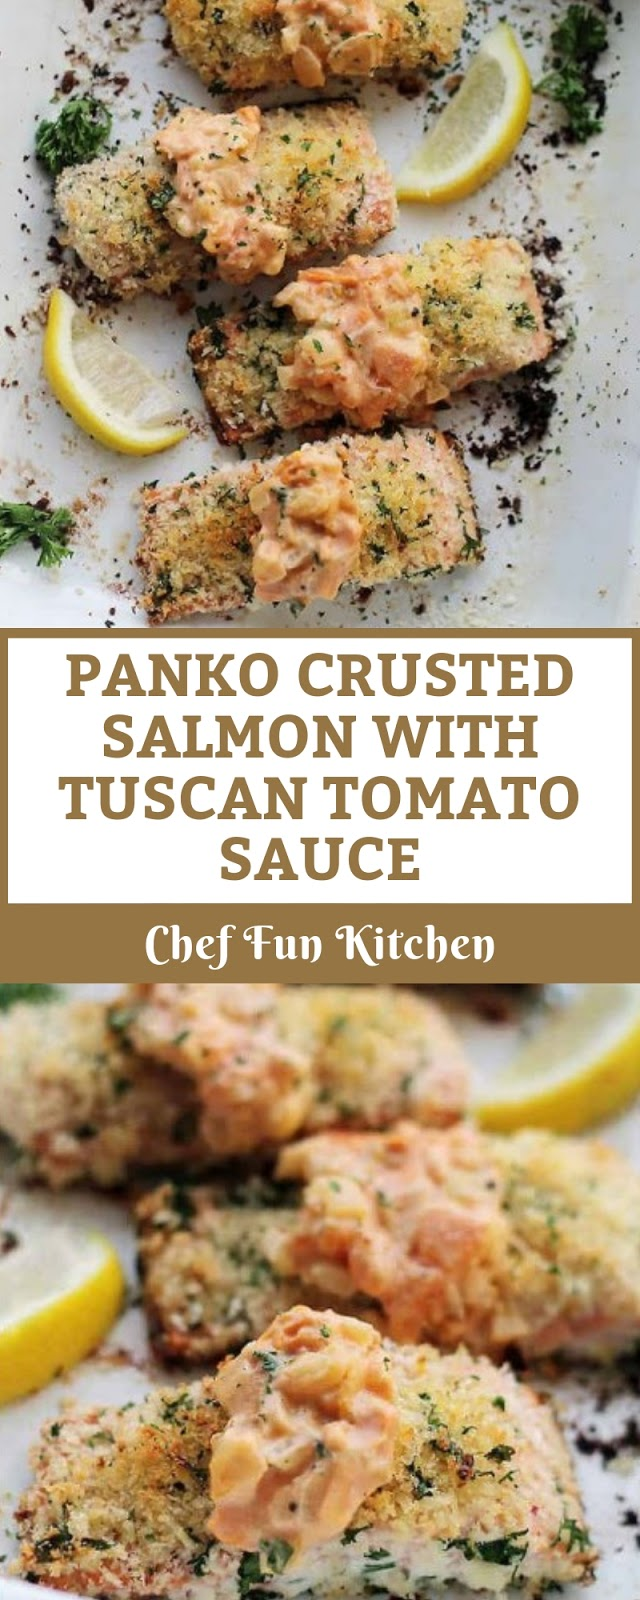 PANKO CRUSTED SALMON WITH TUSCAN TOMATO SAUCE